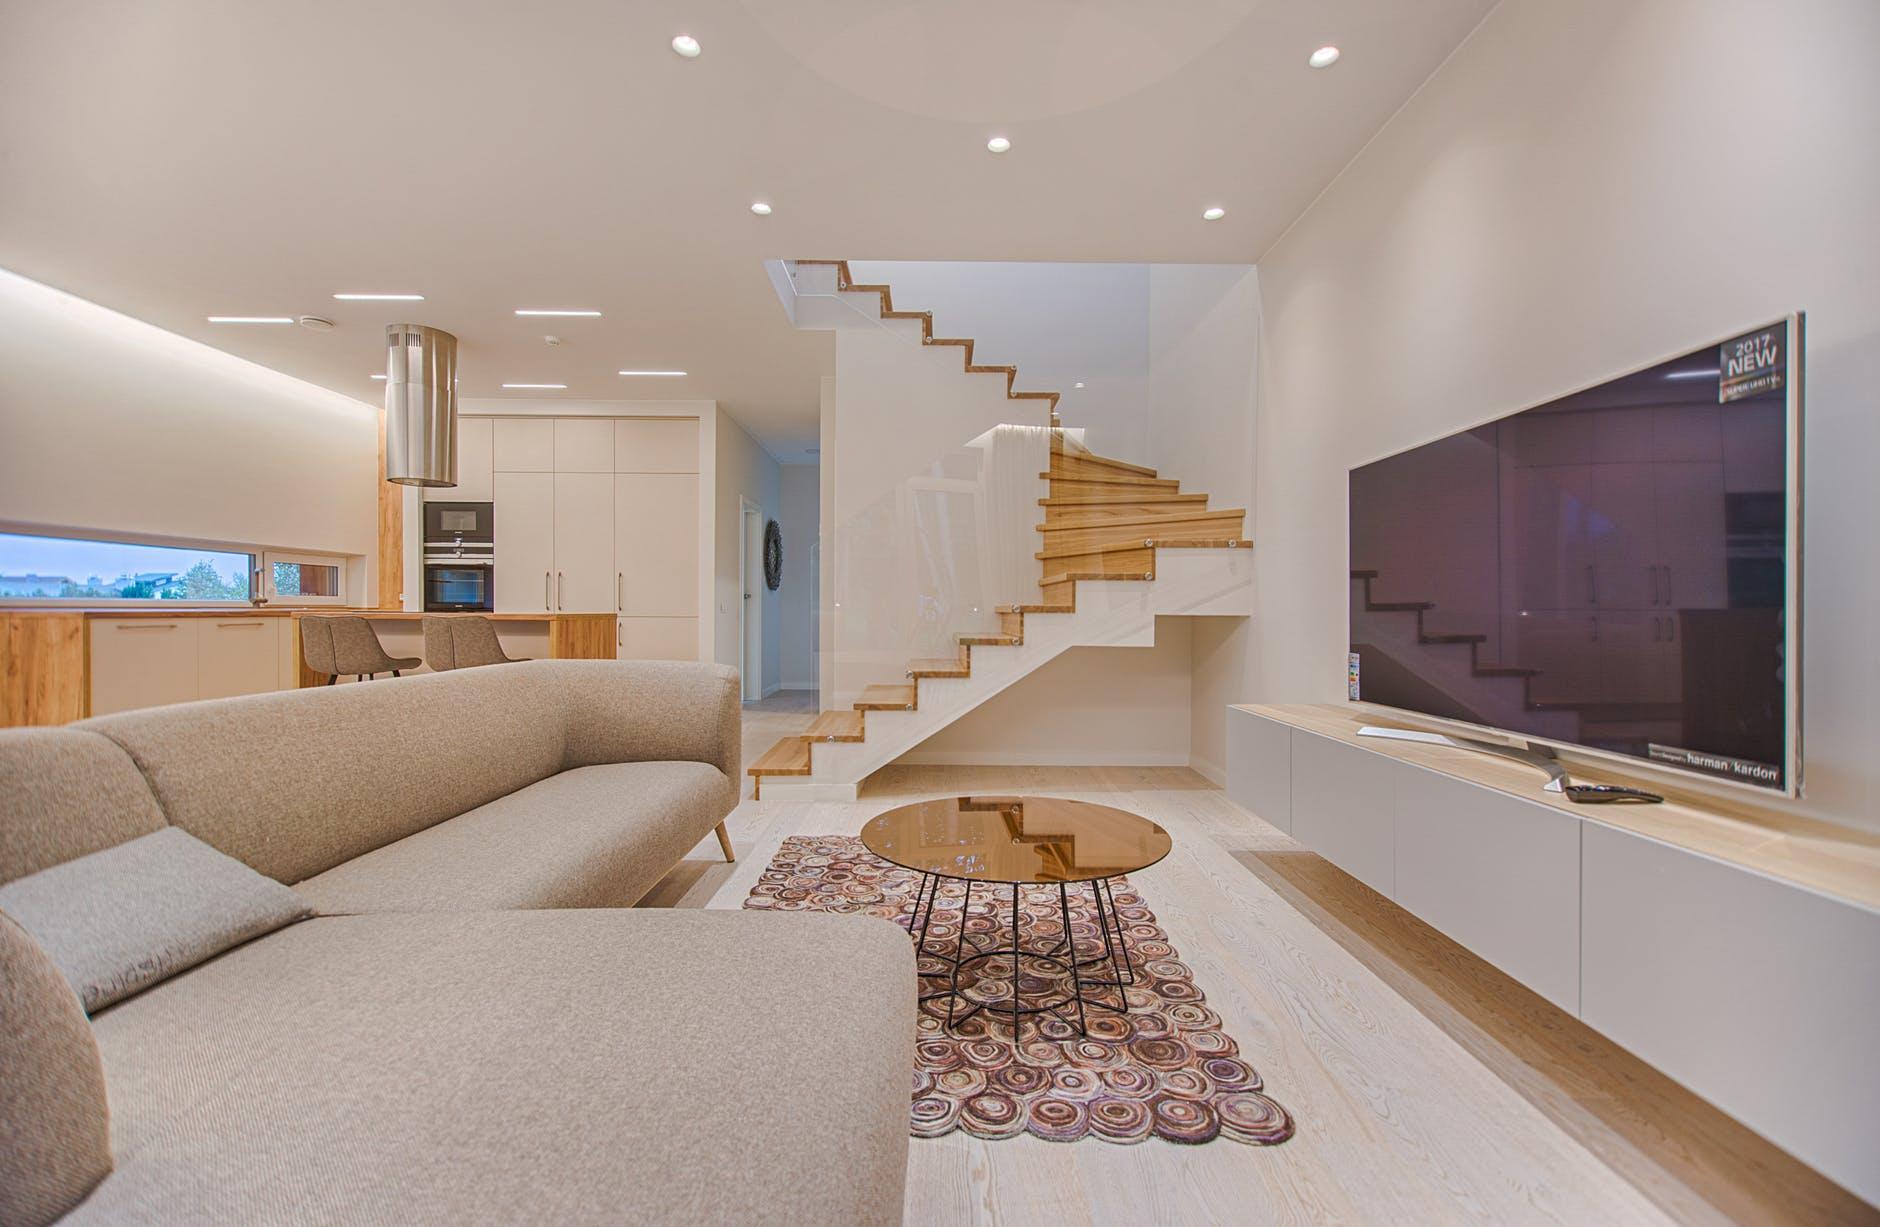 Rug Designs For Living Room 6